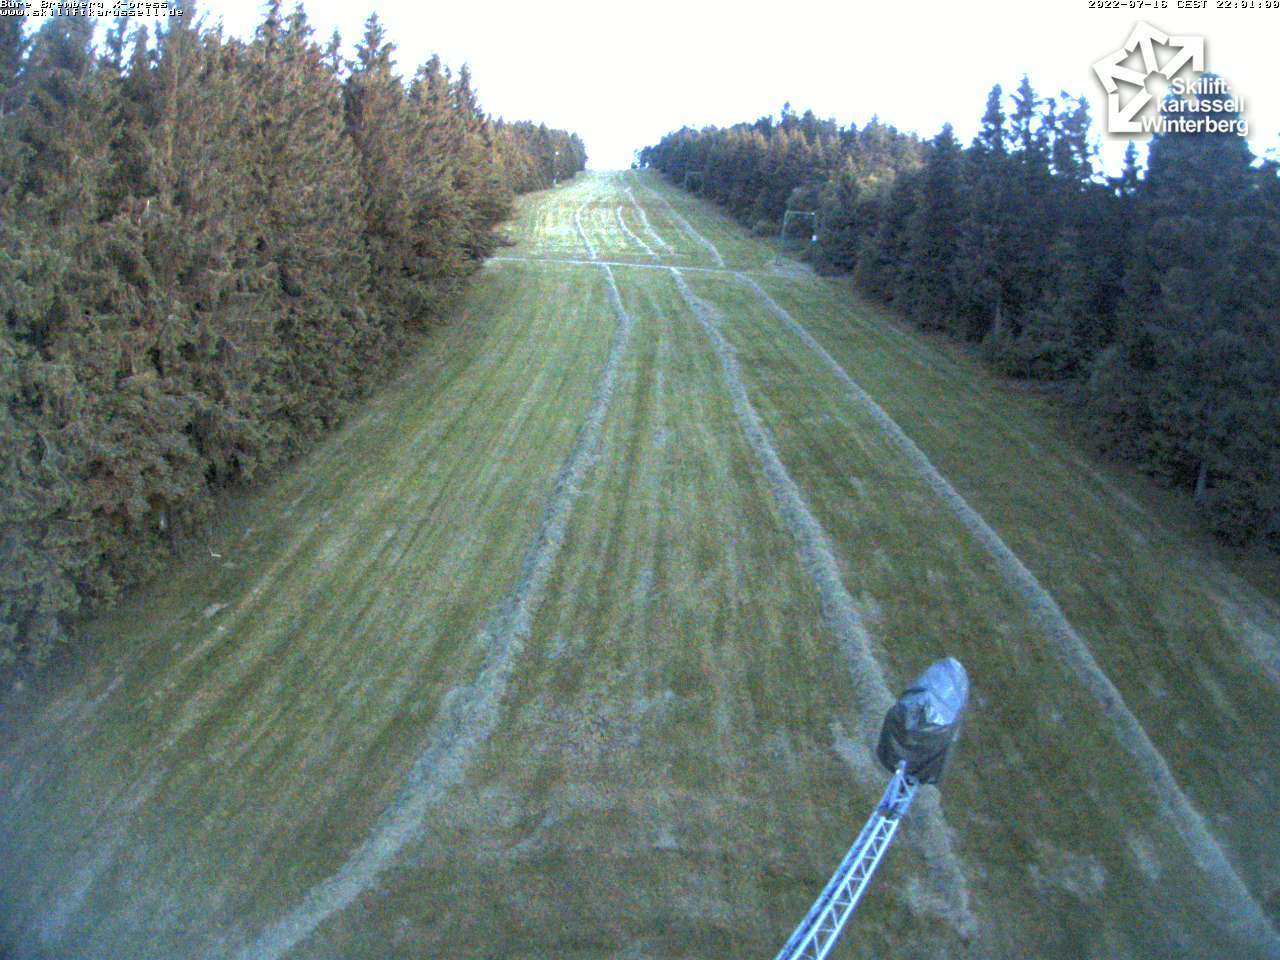 Webcam Bremberglift - Skilifkarussell Winterberg